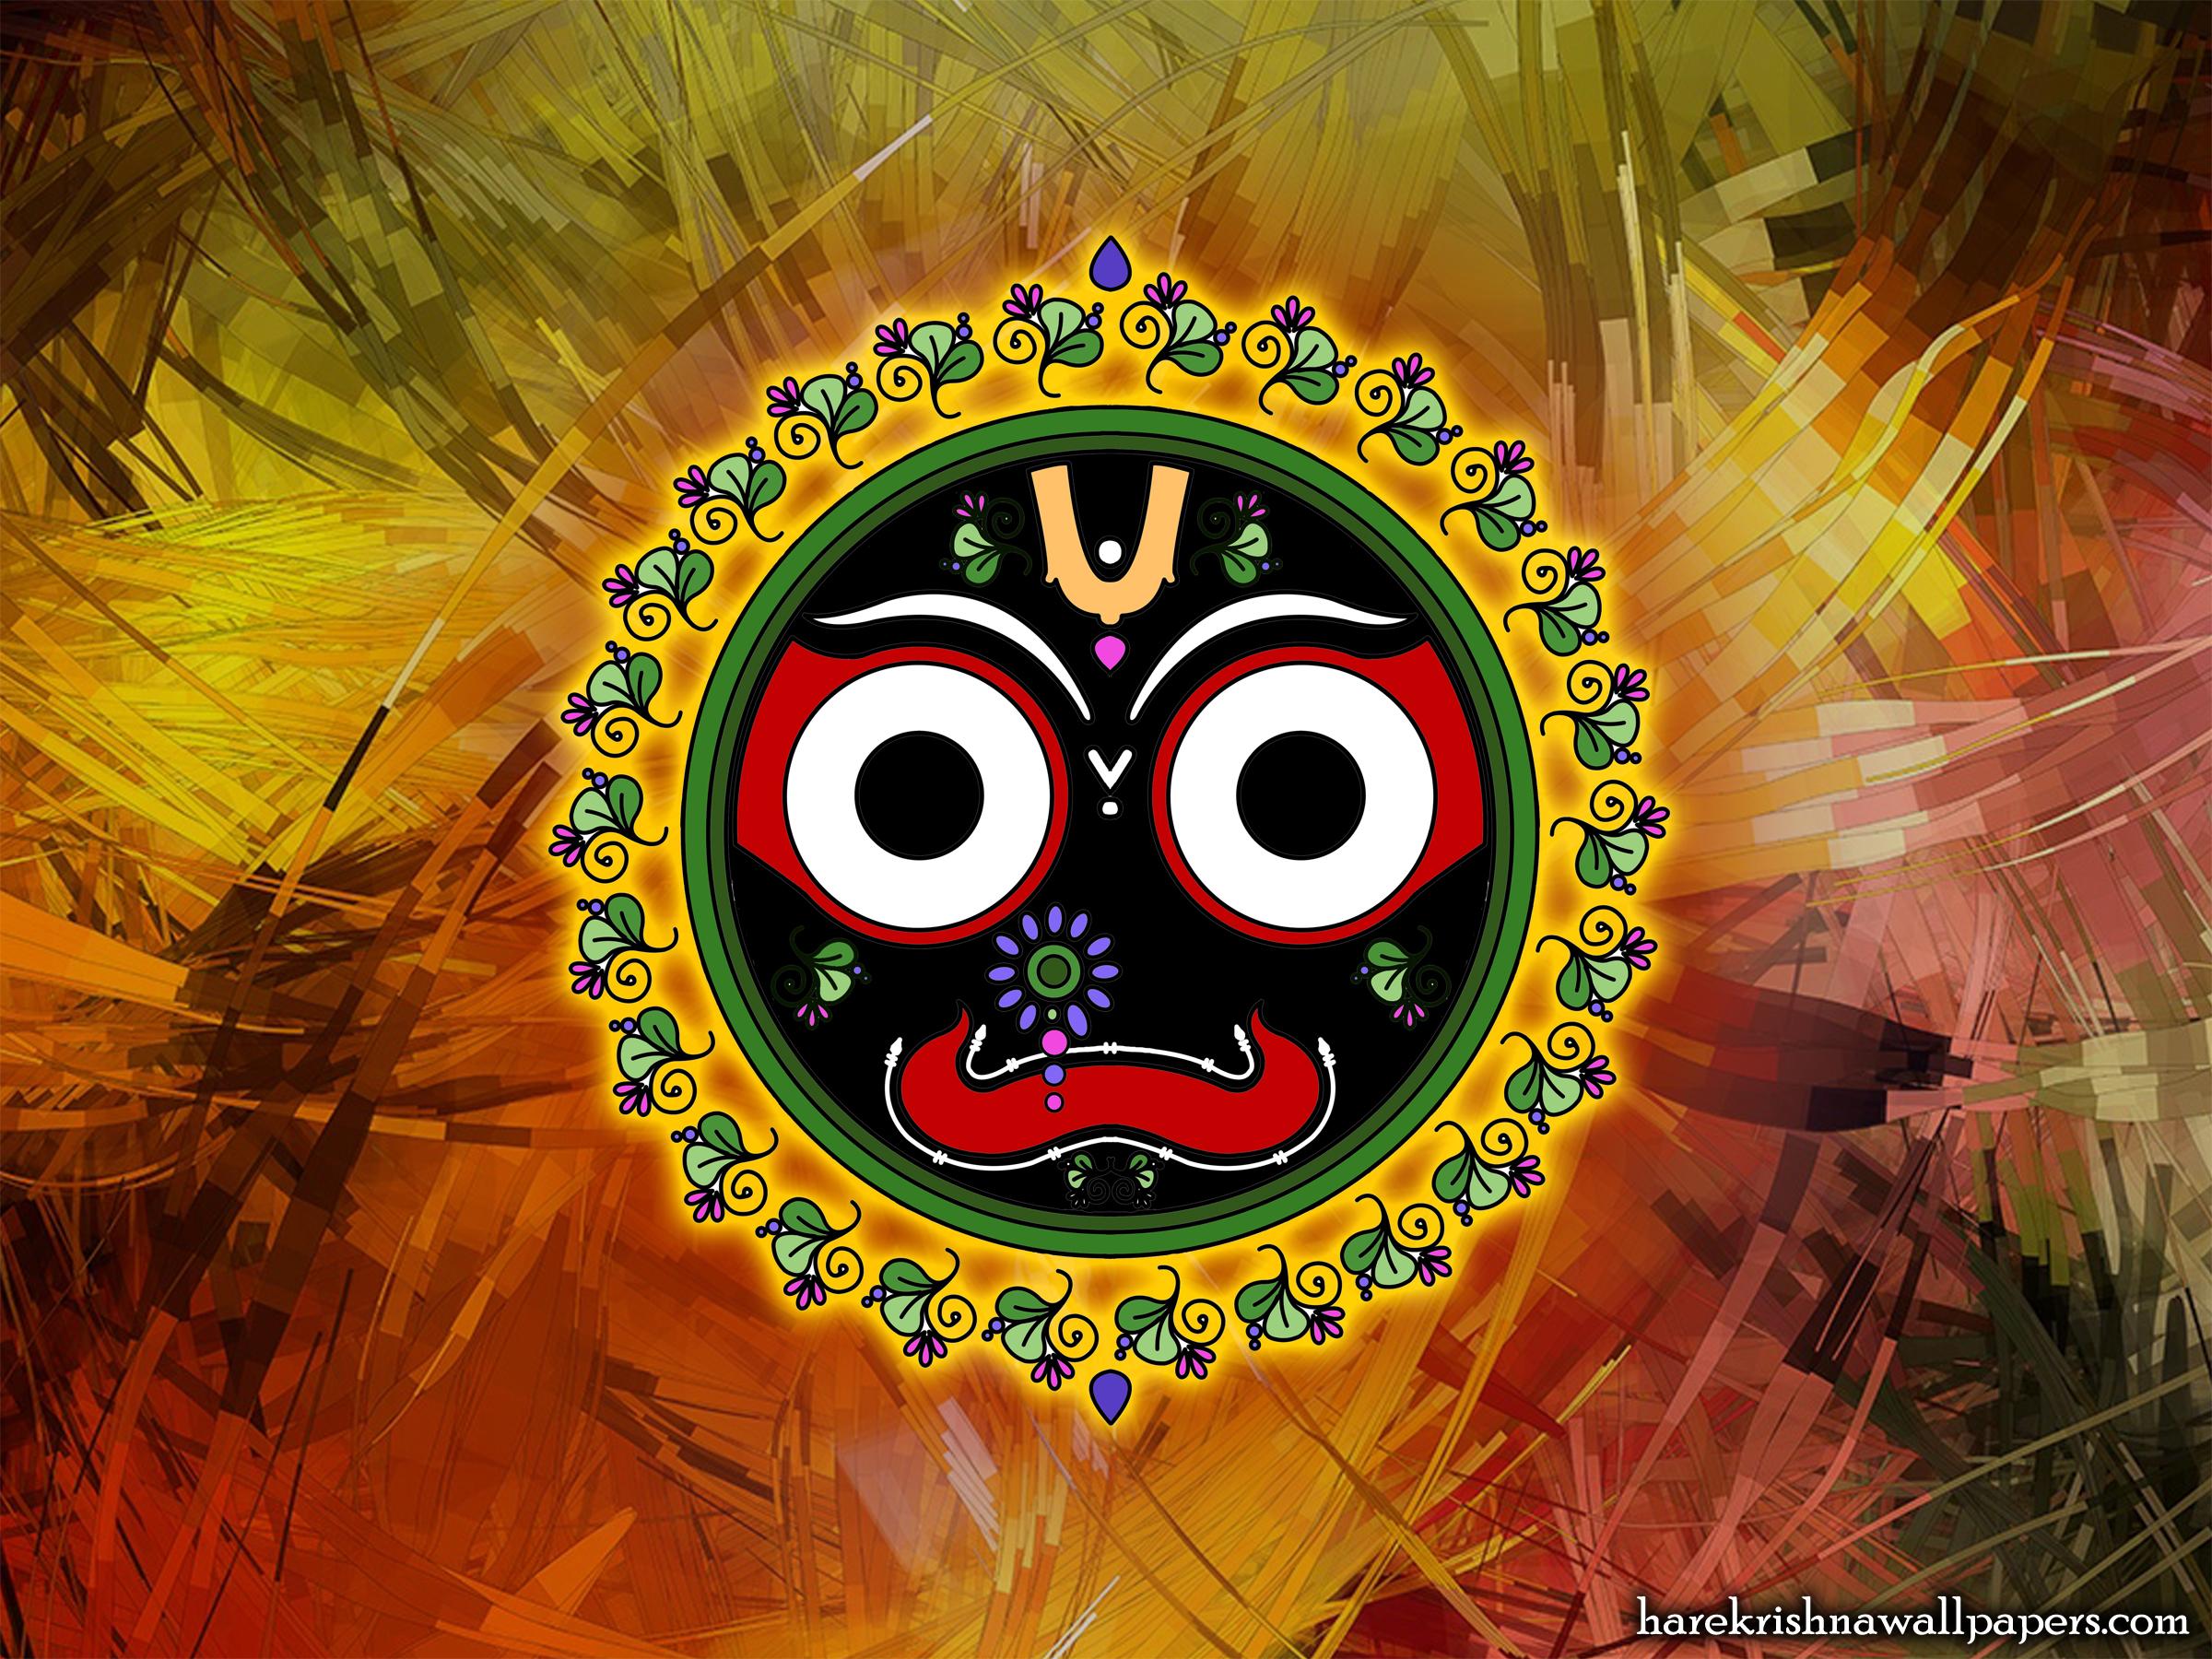 Jai Jagannath Wallpaper (024) Size 2400x1800 Download